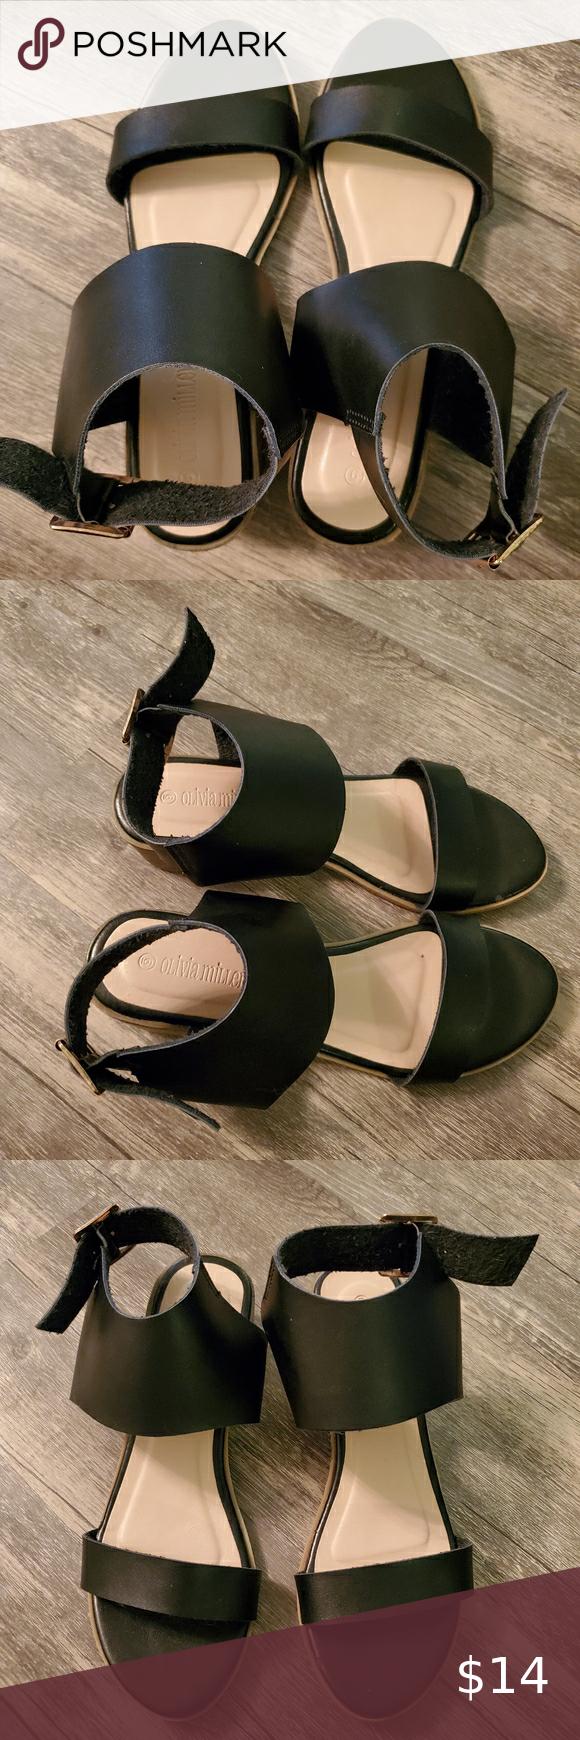 Buckle sandals, Dsw shoes